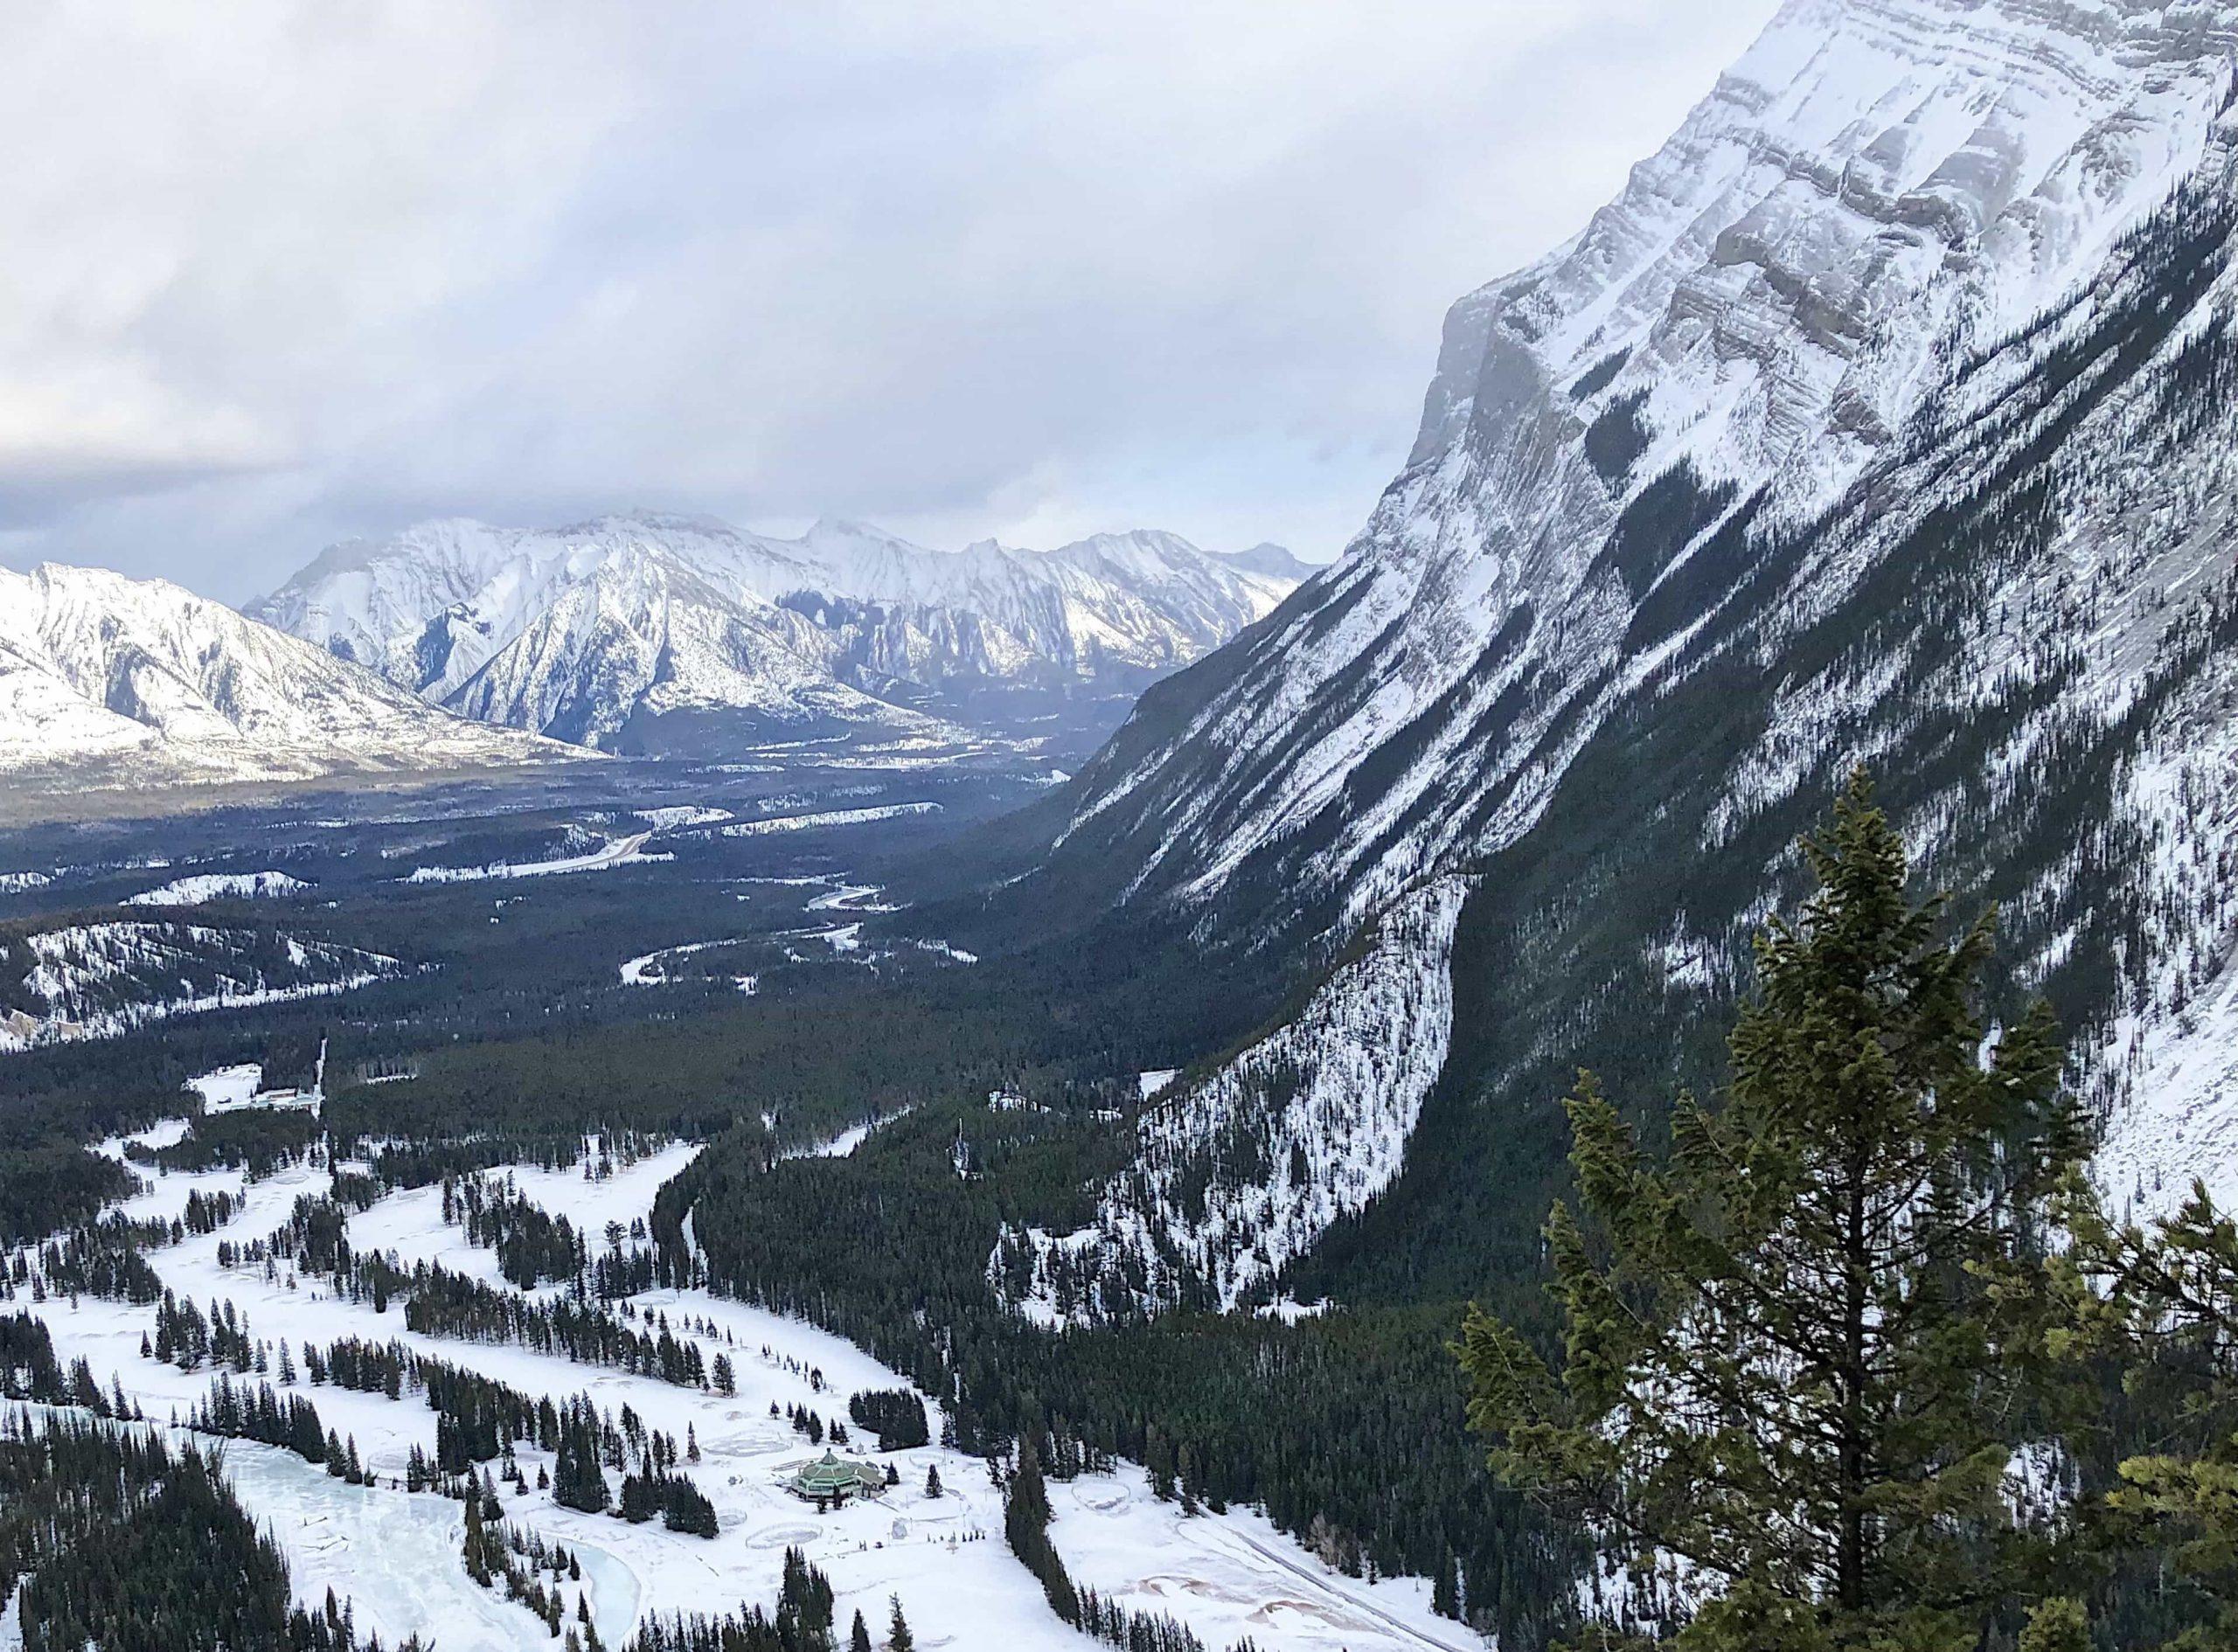 Banff's Tunnel Mountain Hike is Wonderful in Winter via @outandacross